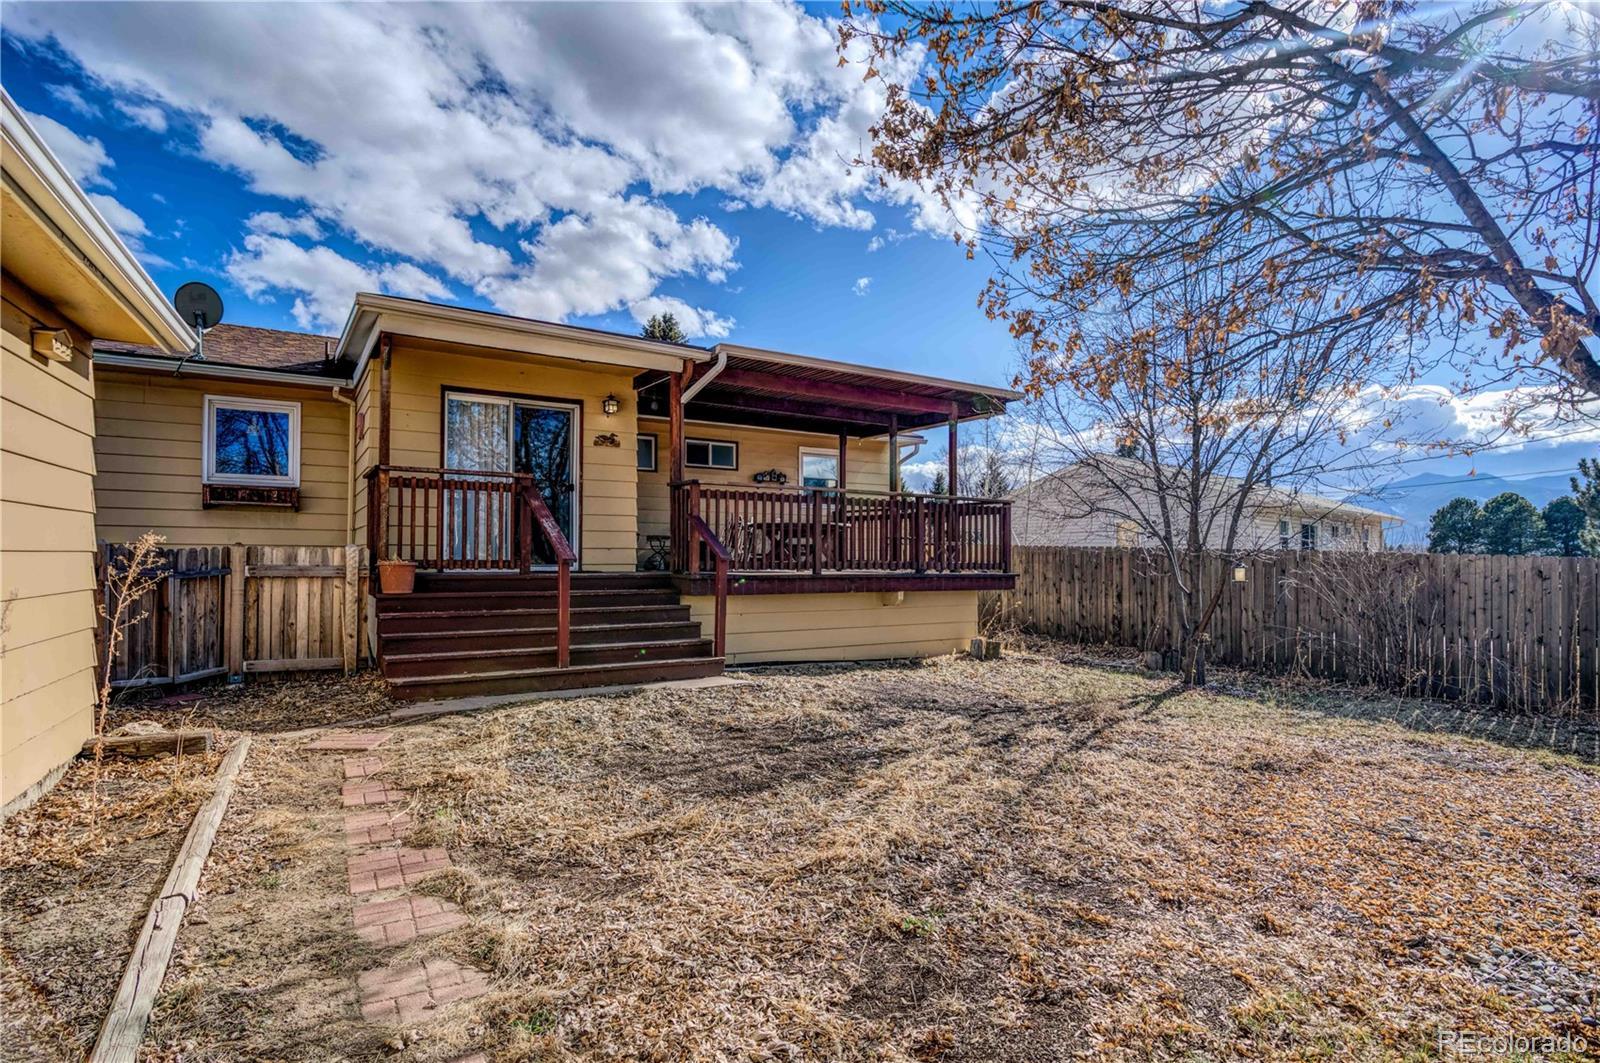 MLS# 5043109 - 31 - 1832 Northview Drive, Colorado Springs, CO 80909